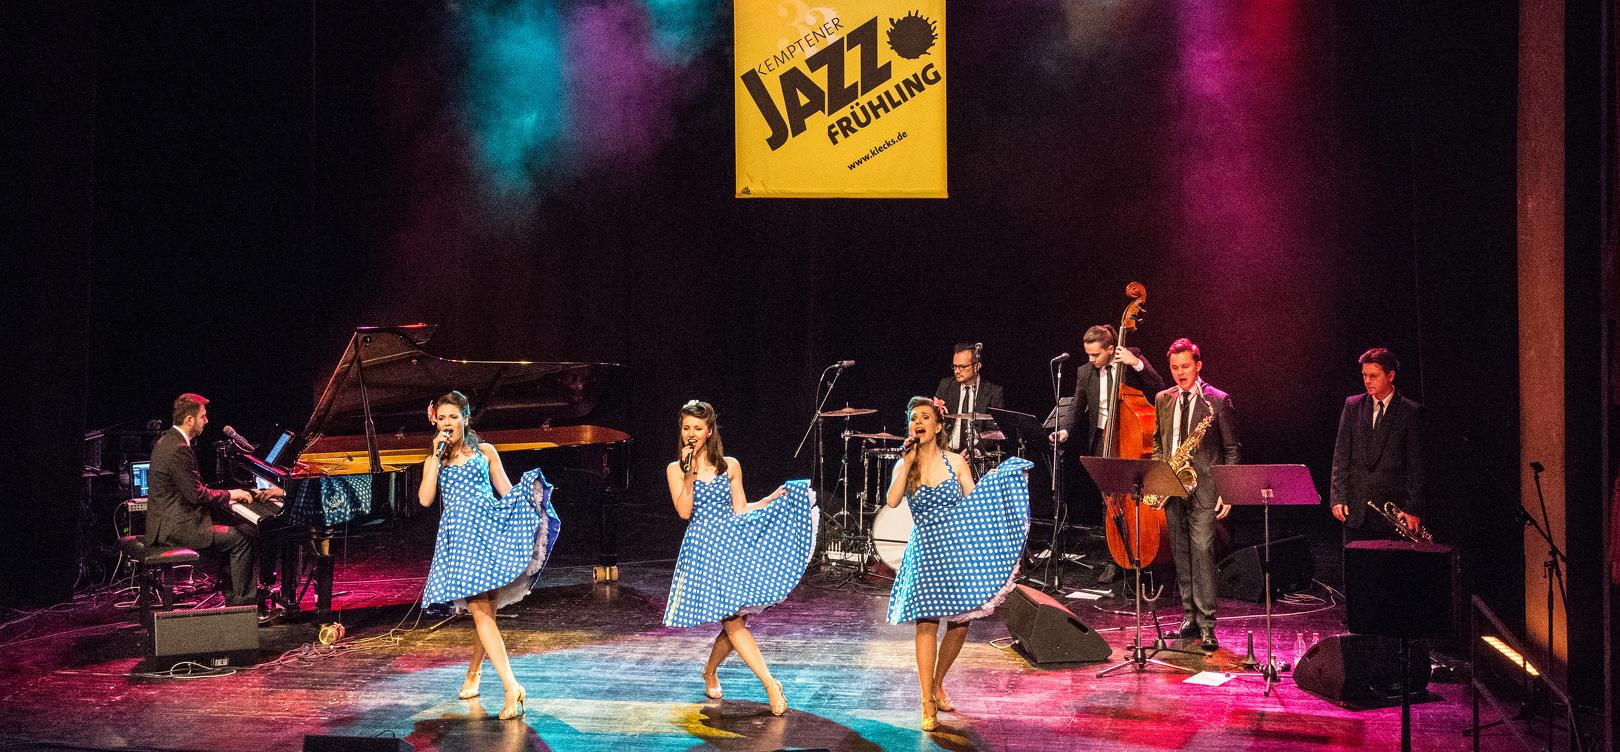 Kemptener Jazzfrühling